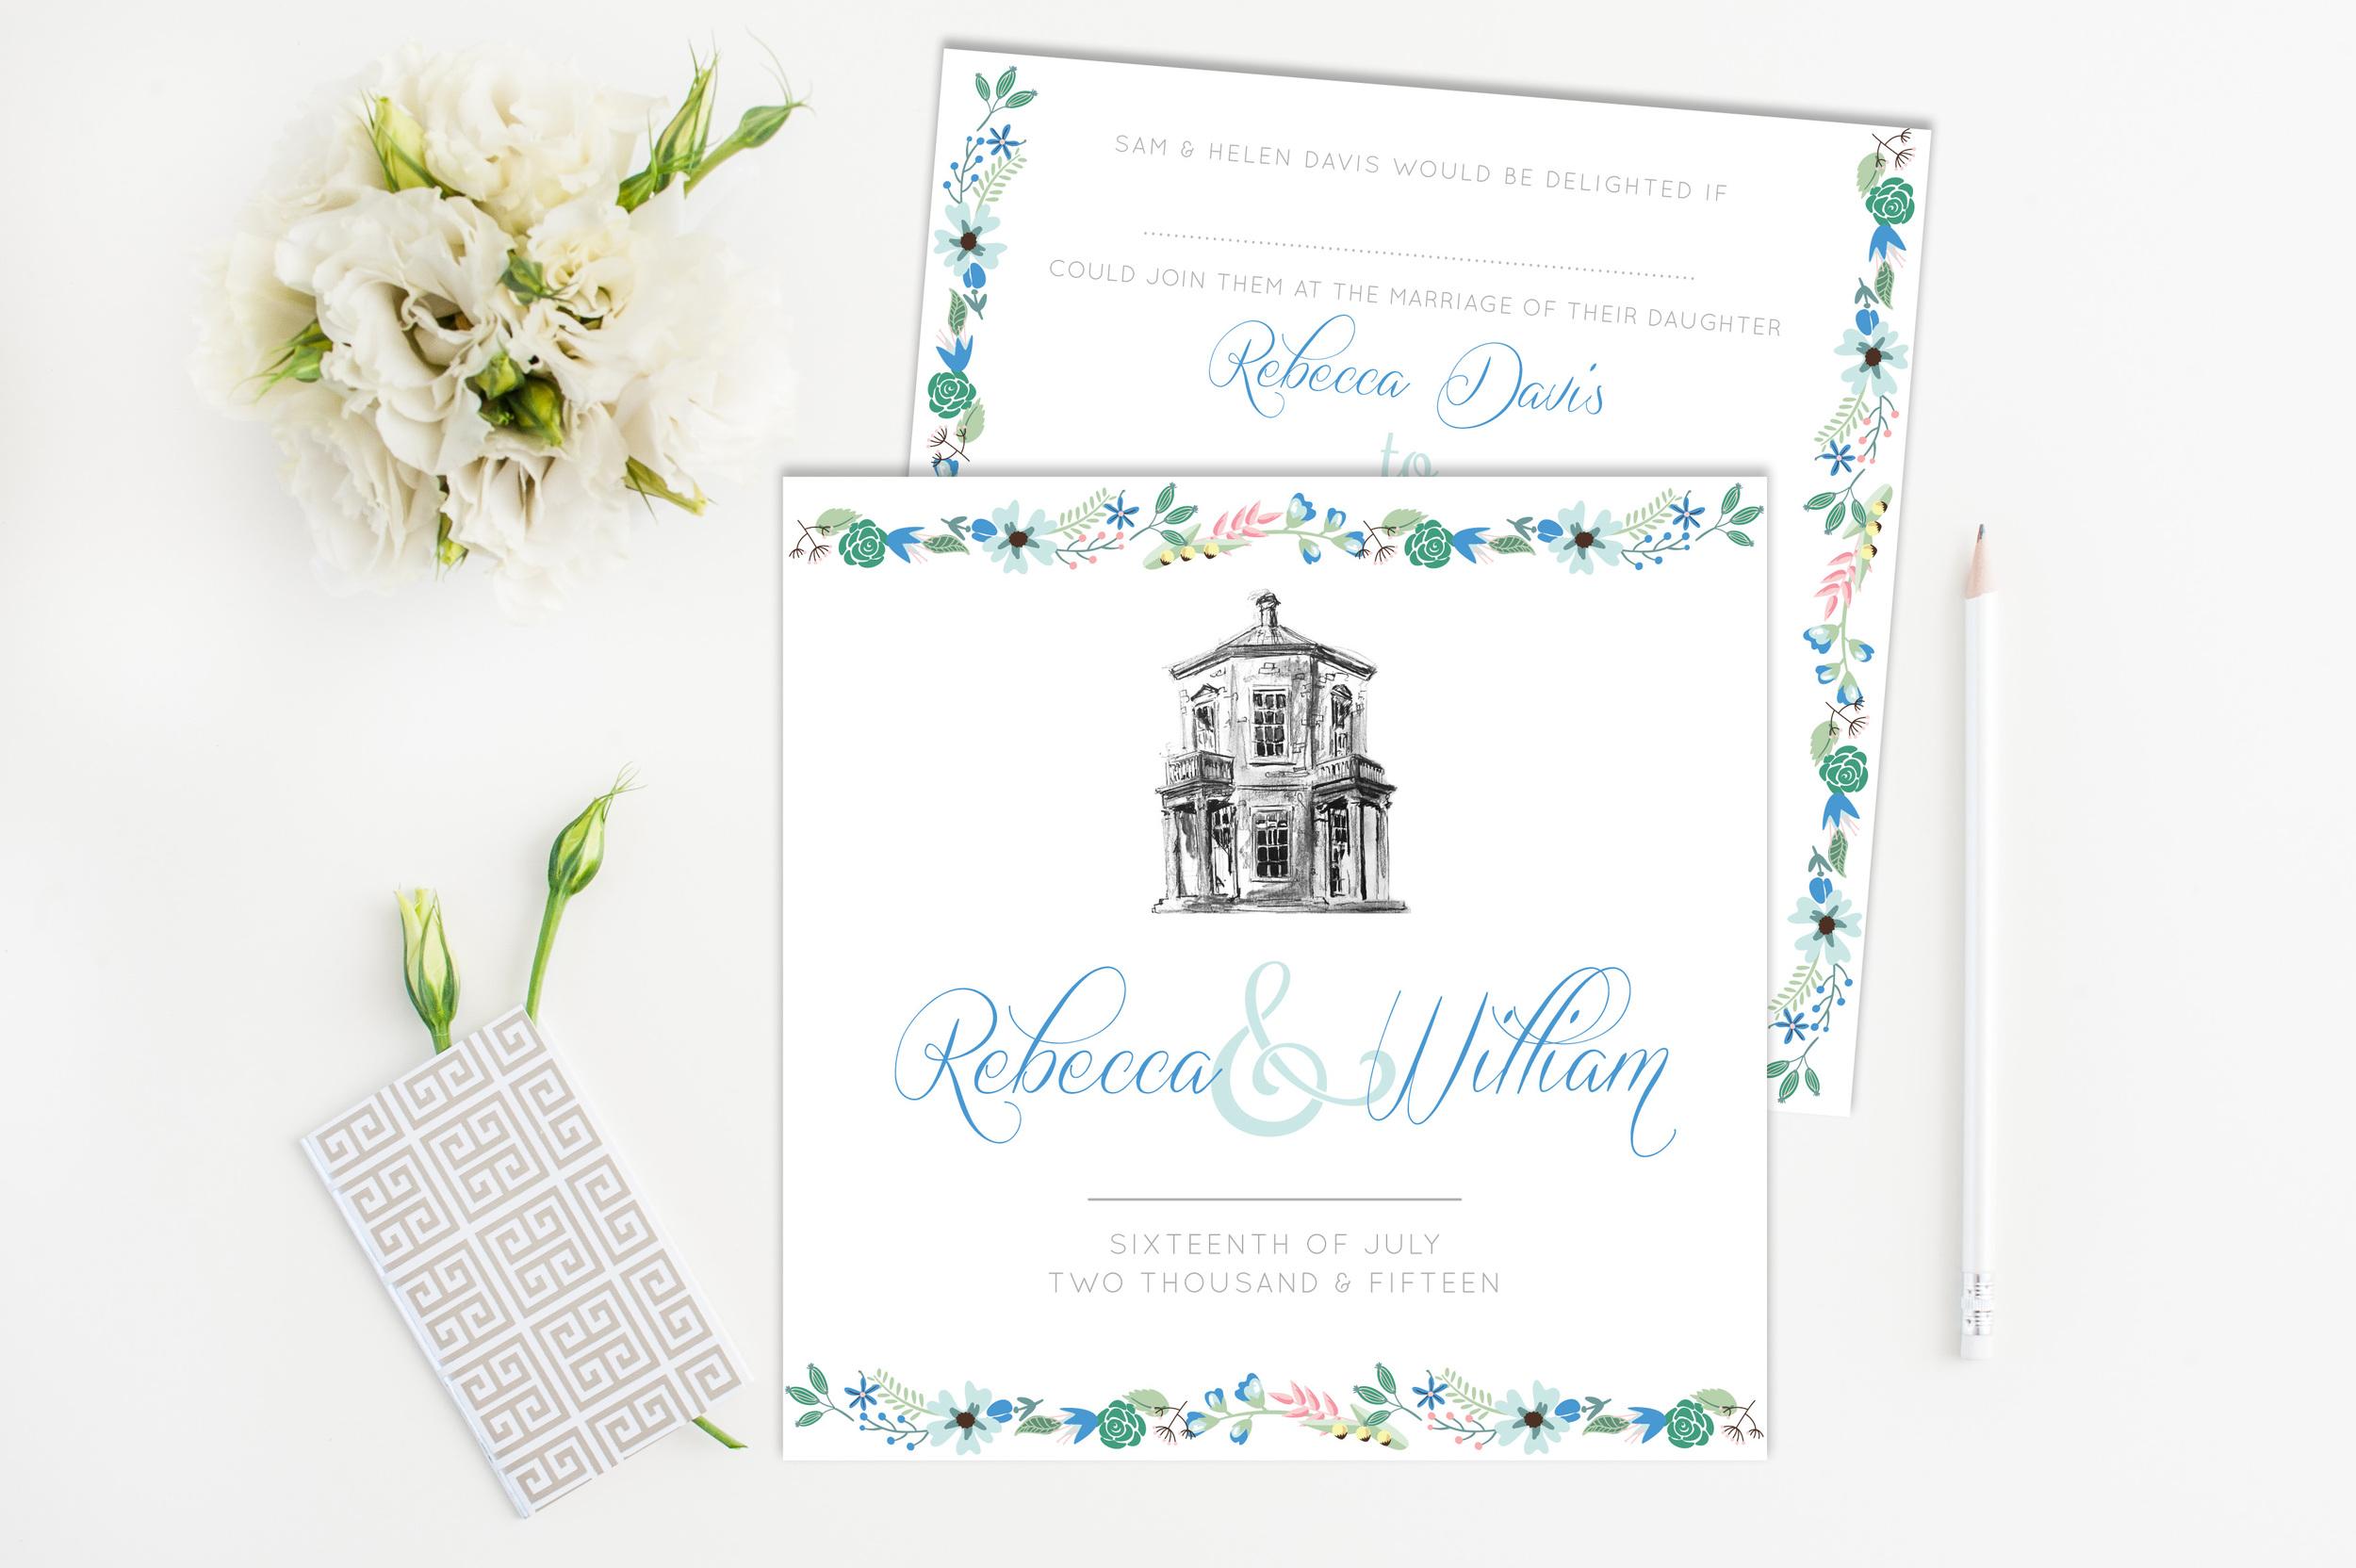 The White Letter Rebecca & William.jpg